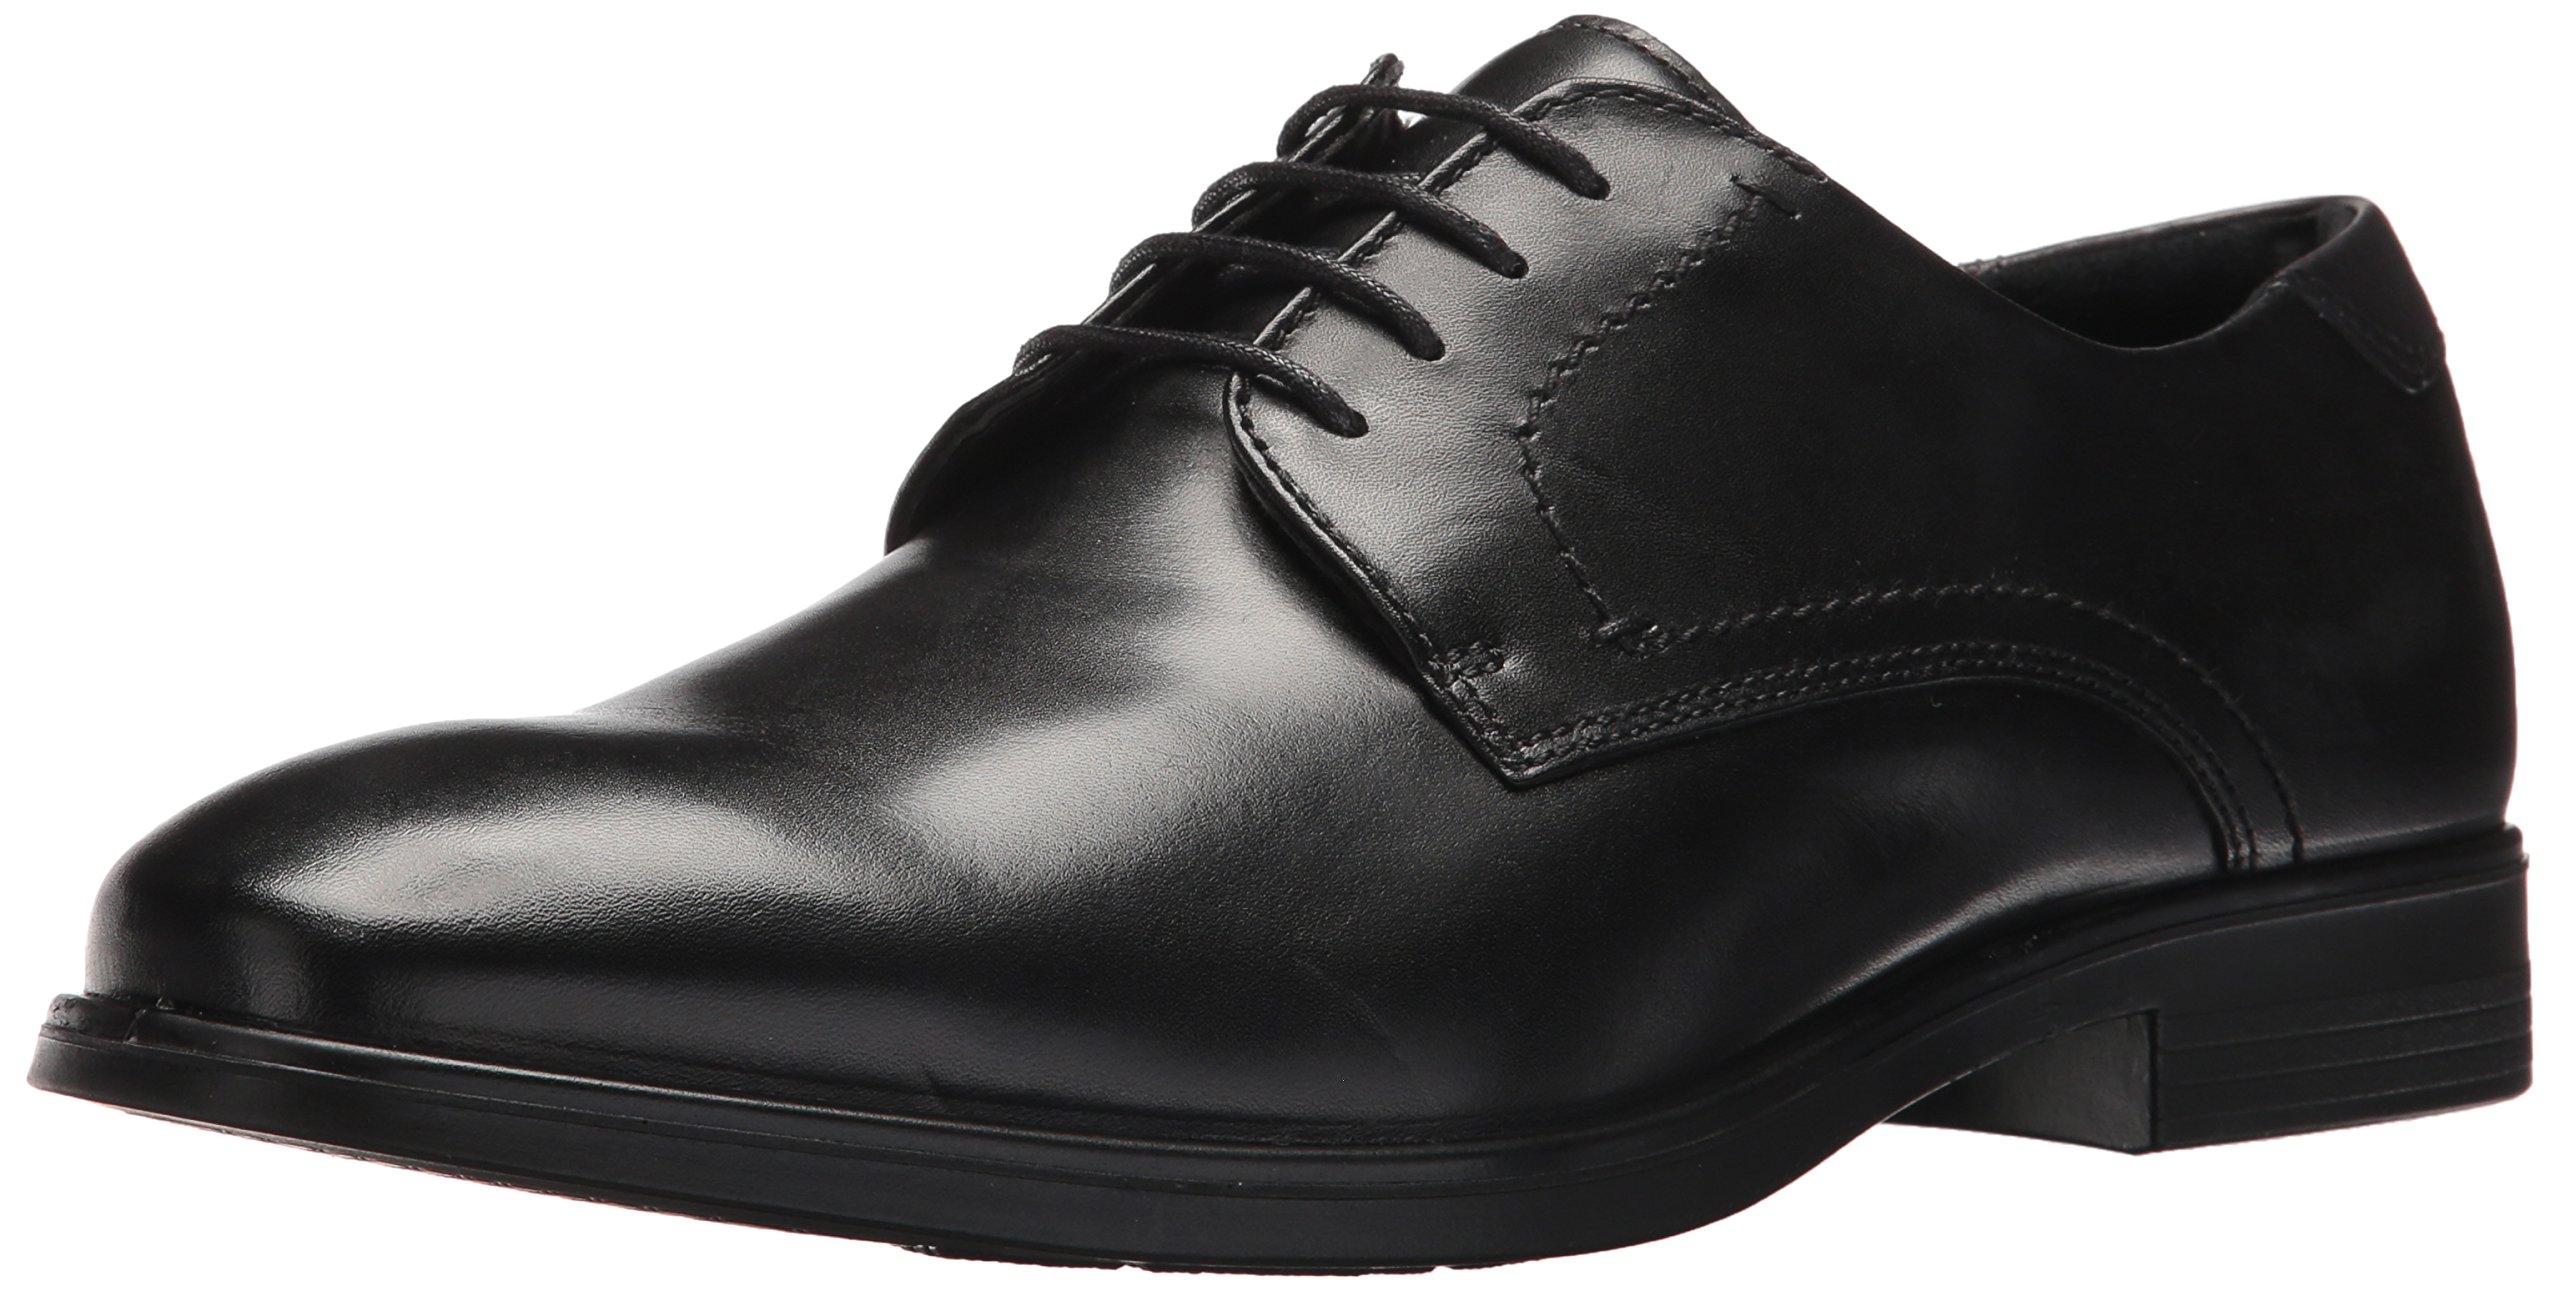 ECCO Men's Melbourne Tie Oxford, Black/Magnet, 44 EU/10-10.5 M US by ECCO